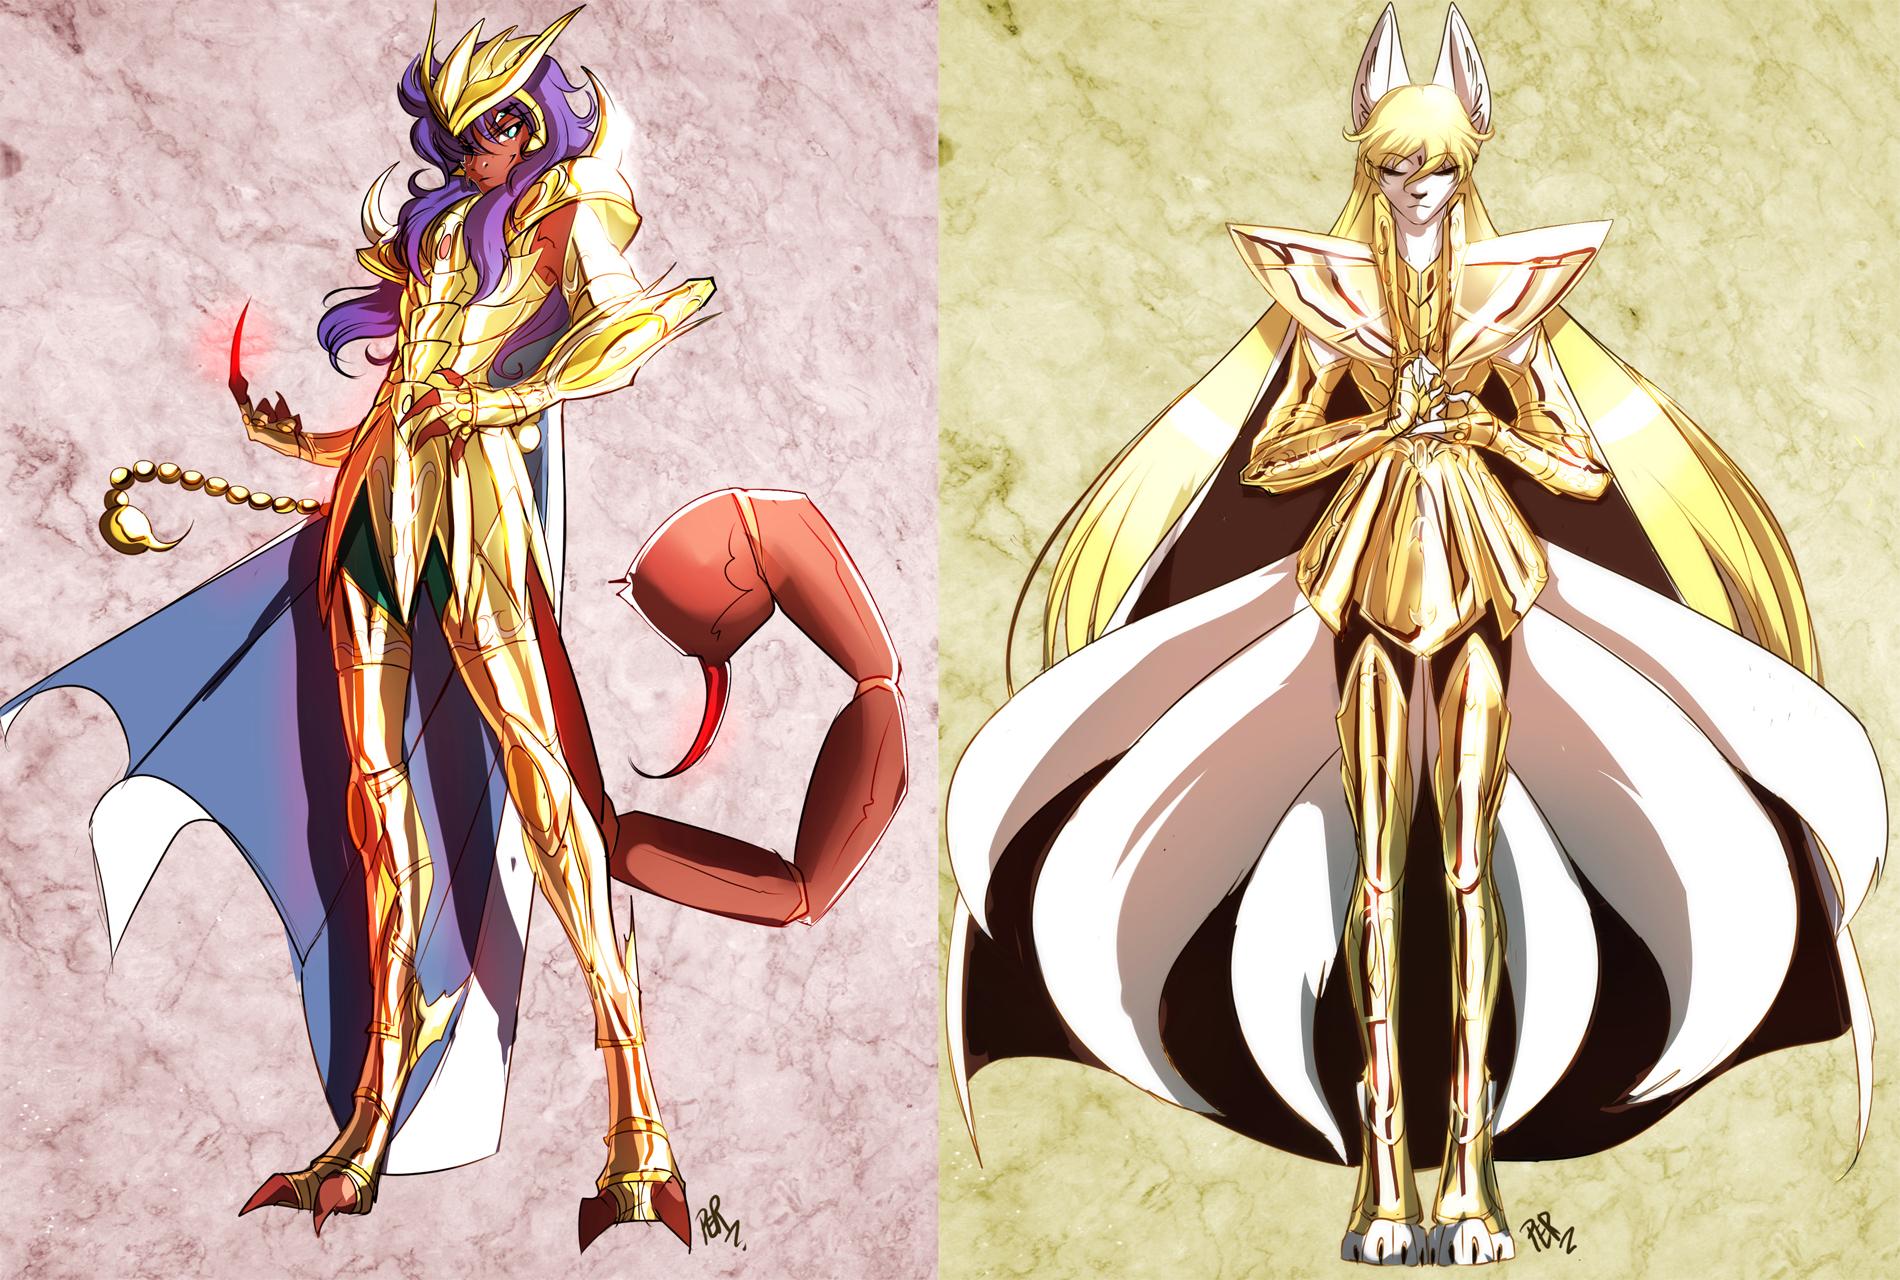 Gold Saints Saint Seiya Image 940113 Zerochan Anime